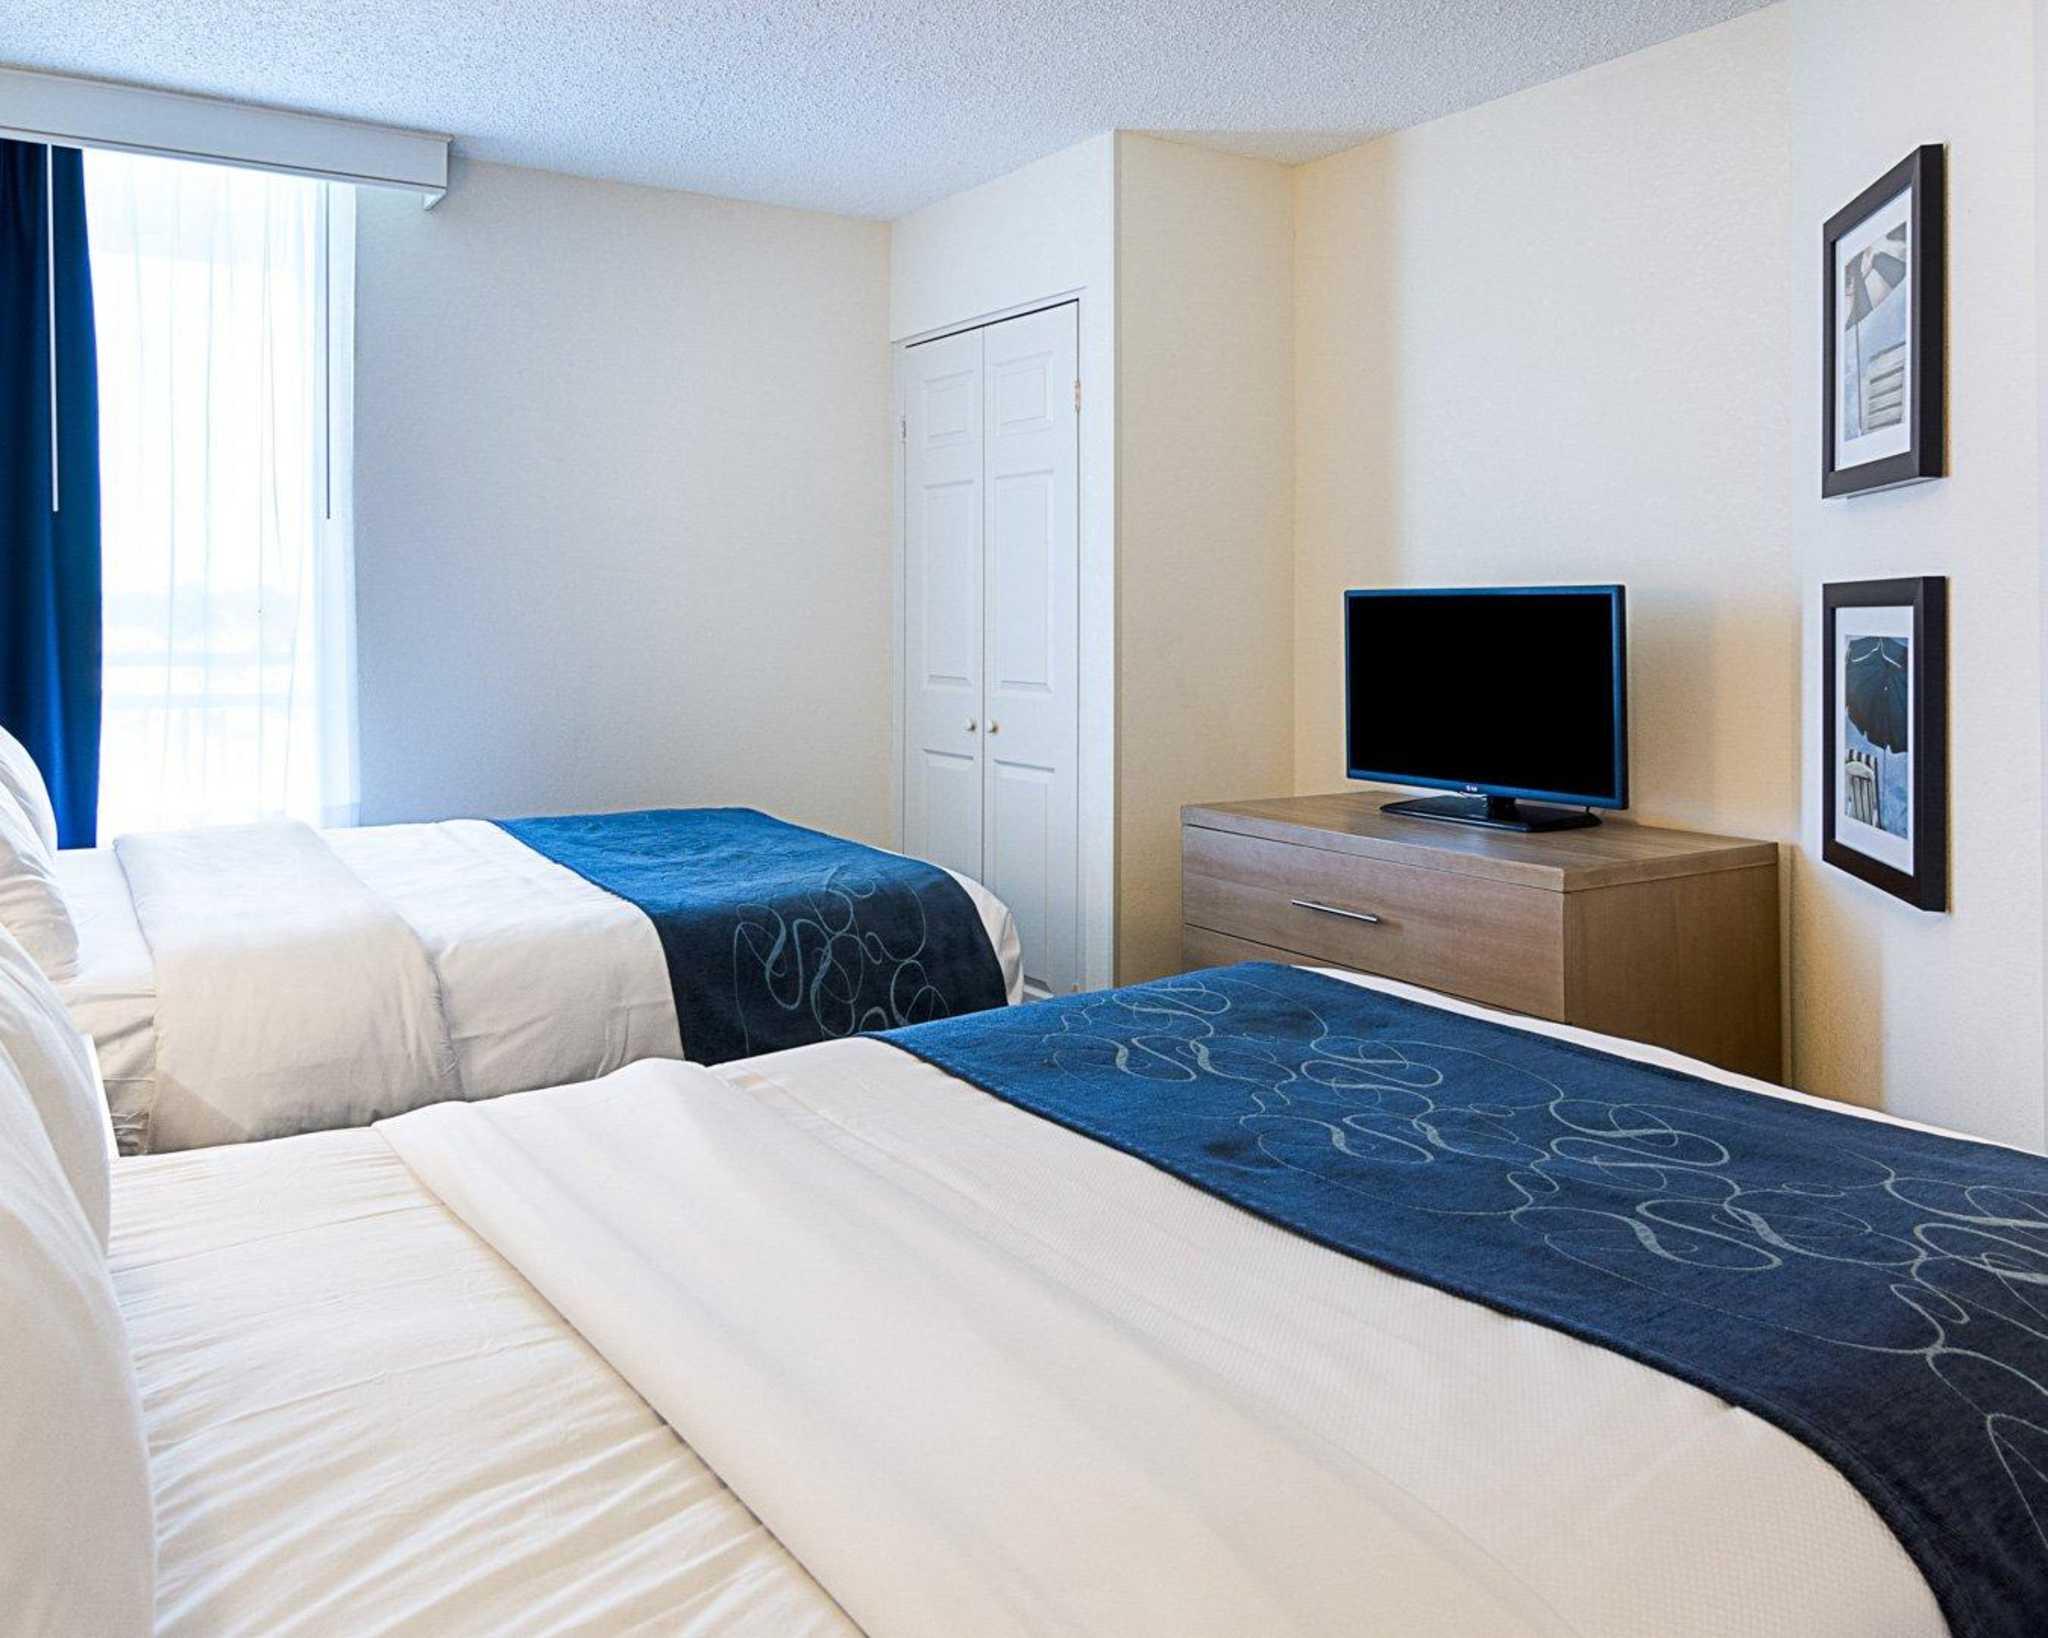 Comfort Suites Beachfront image 20